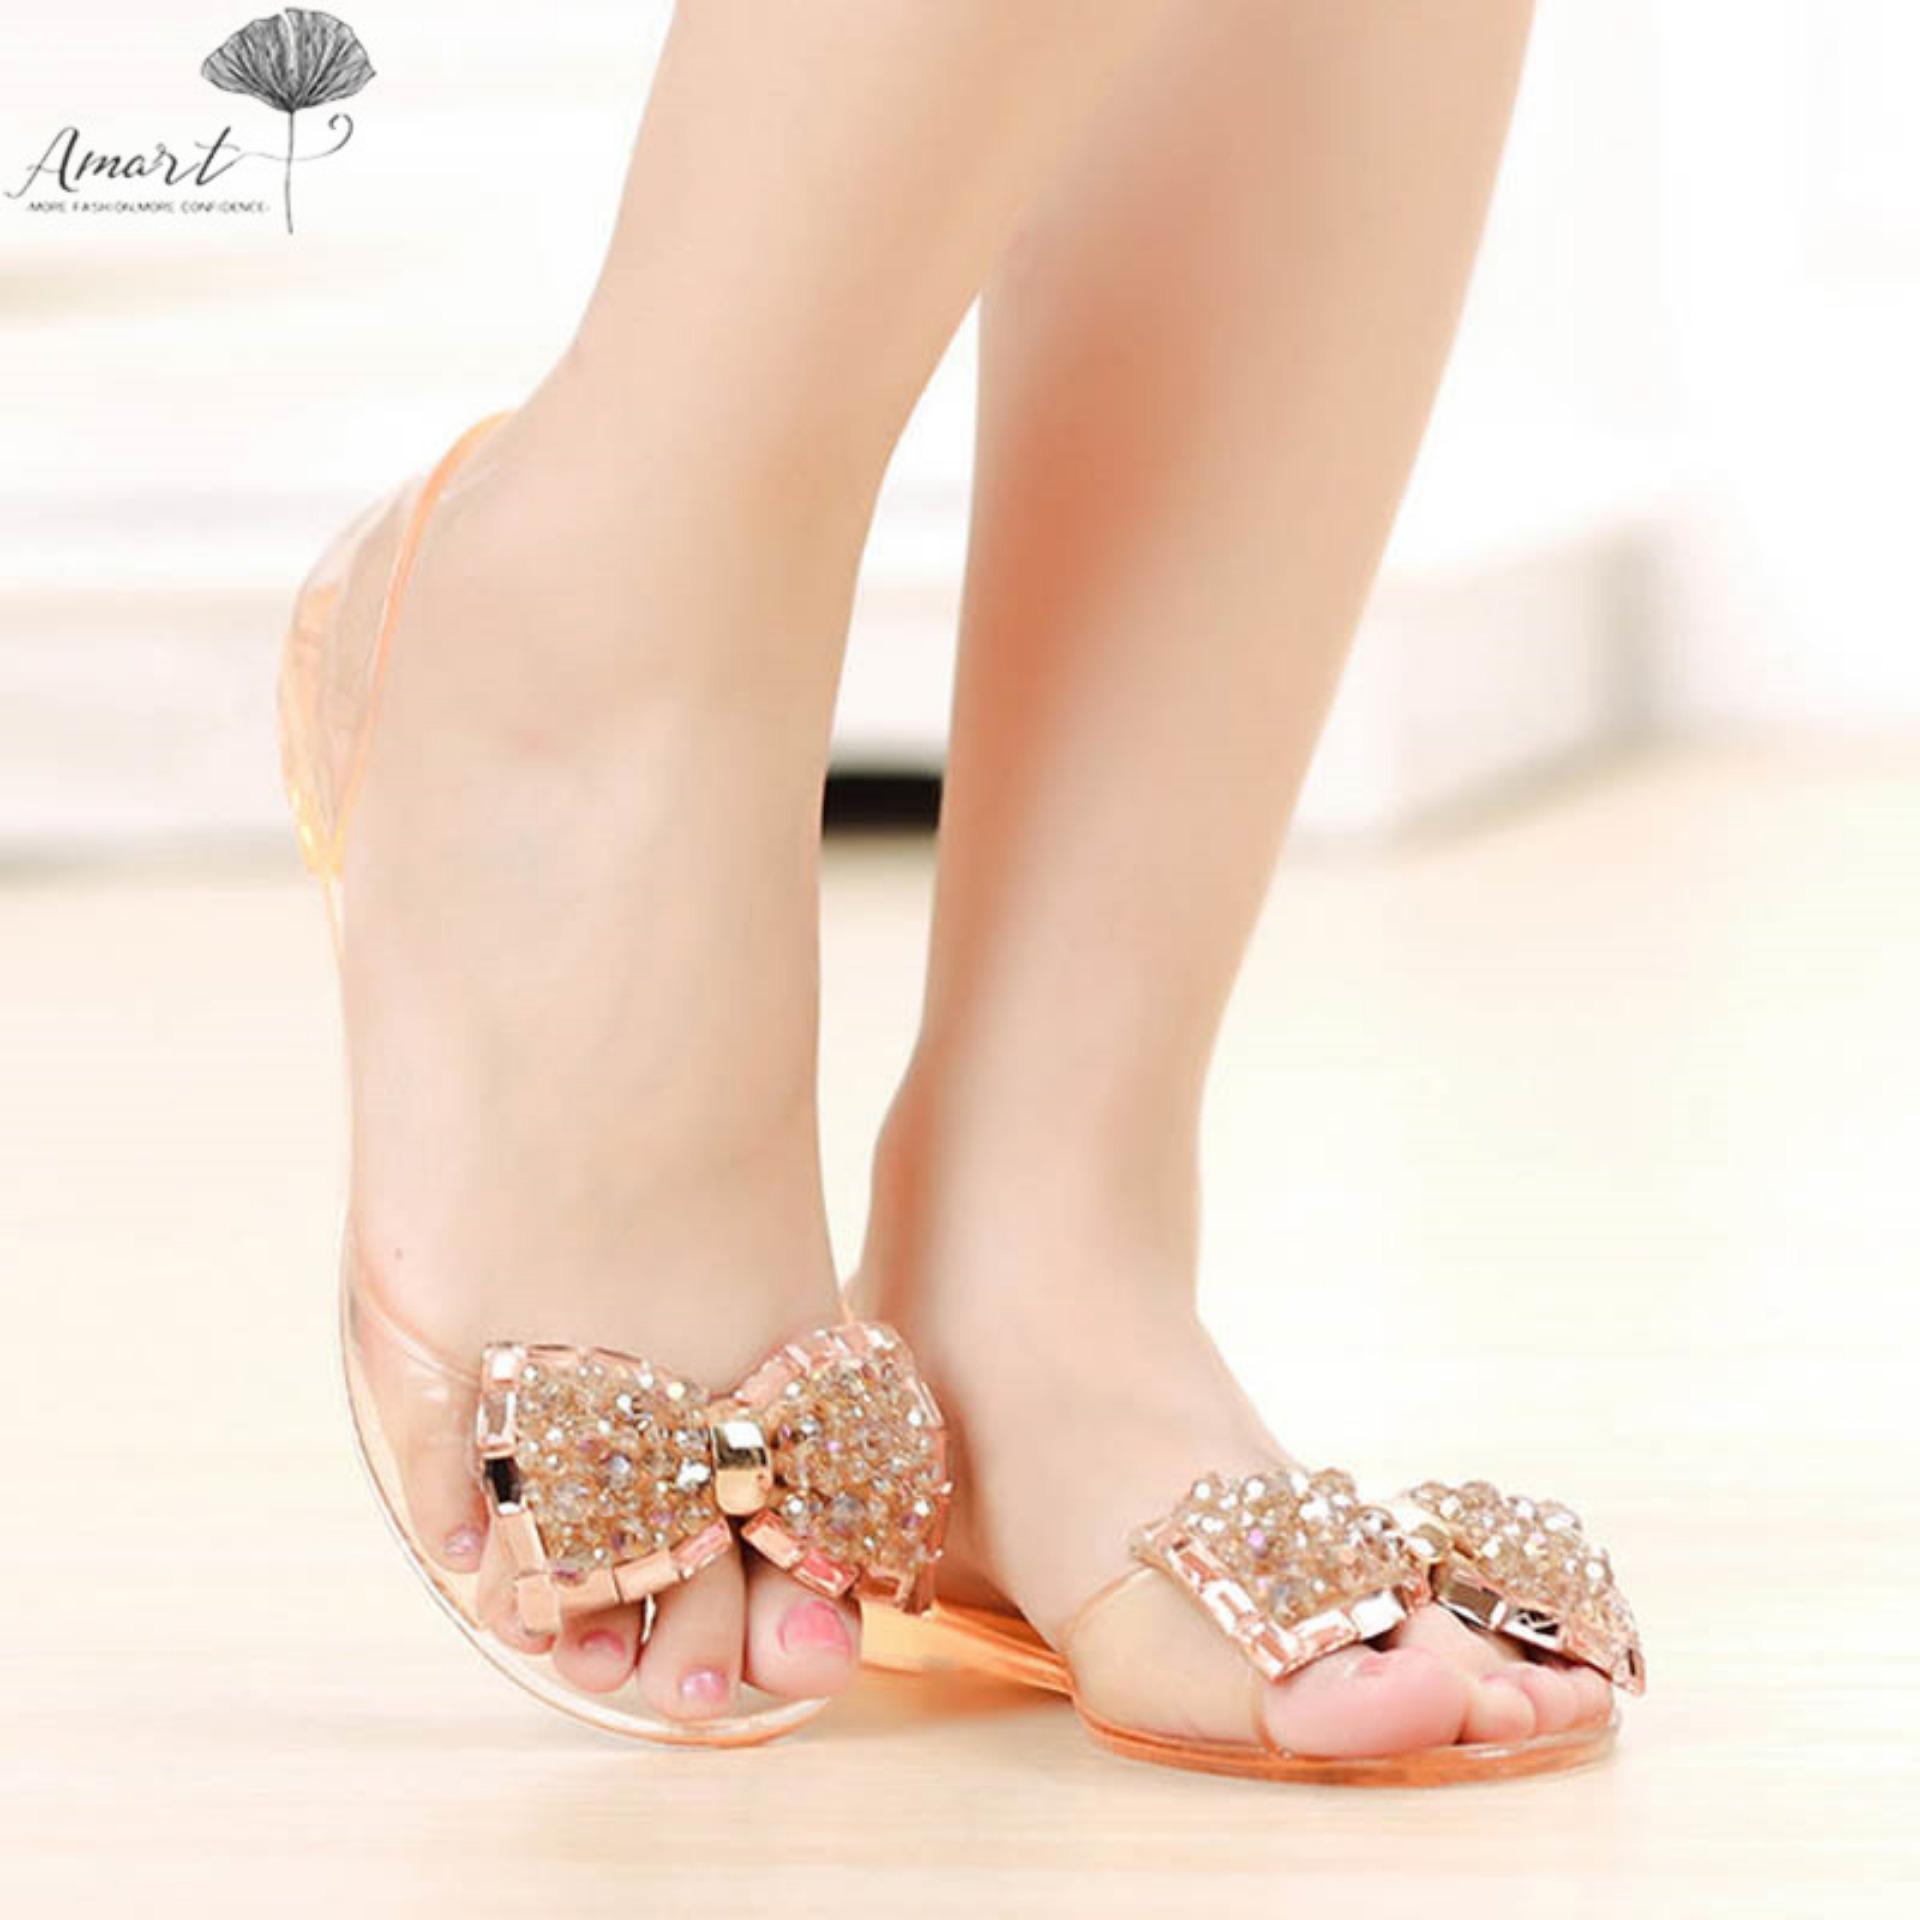 Flat Sandals For Women Sale Summer Online Brands Lady Jelly Shoes Sepatu Sendal Wanita Amart Woman Bow Crystal Sexy Open Toe Beach